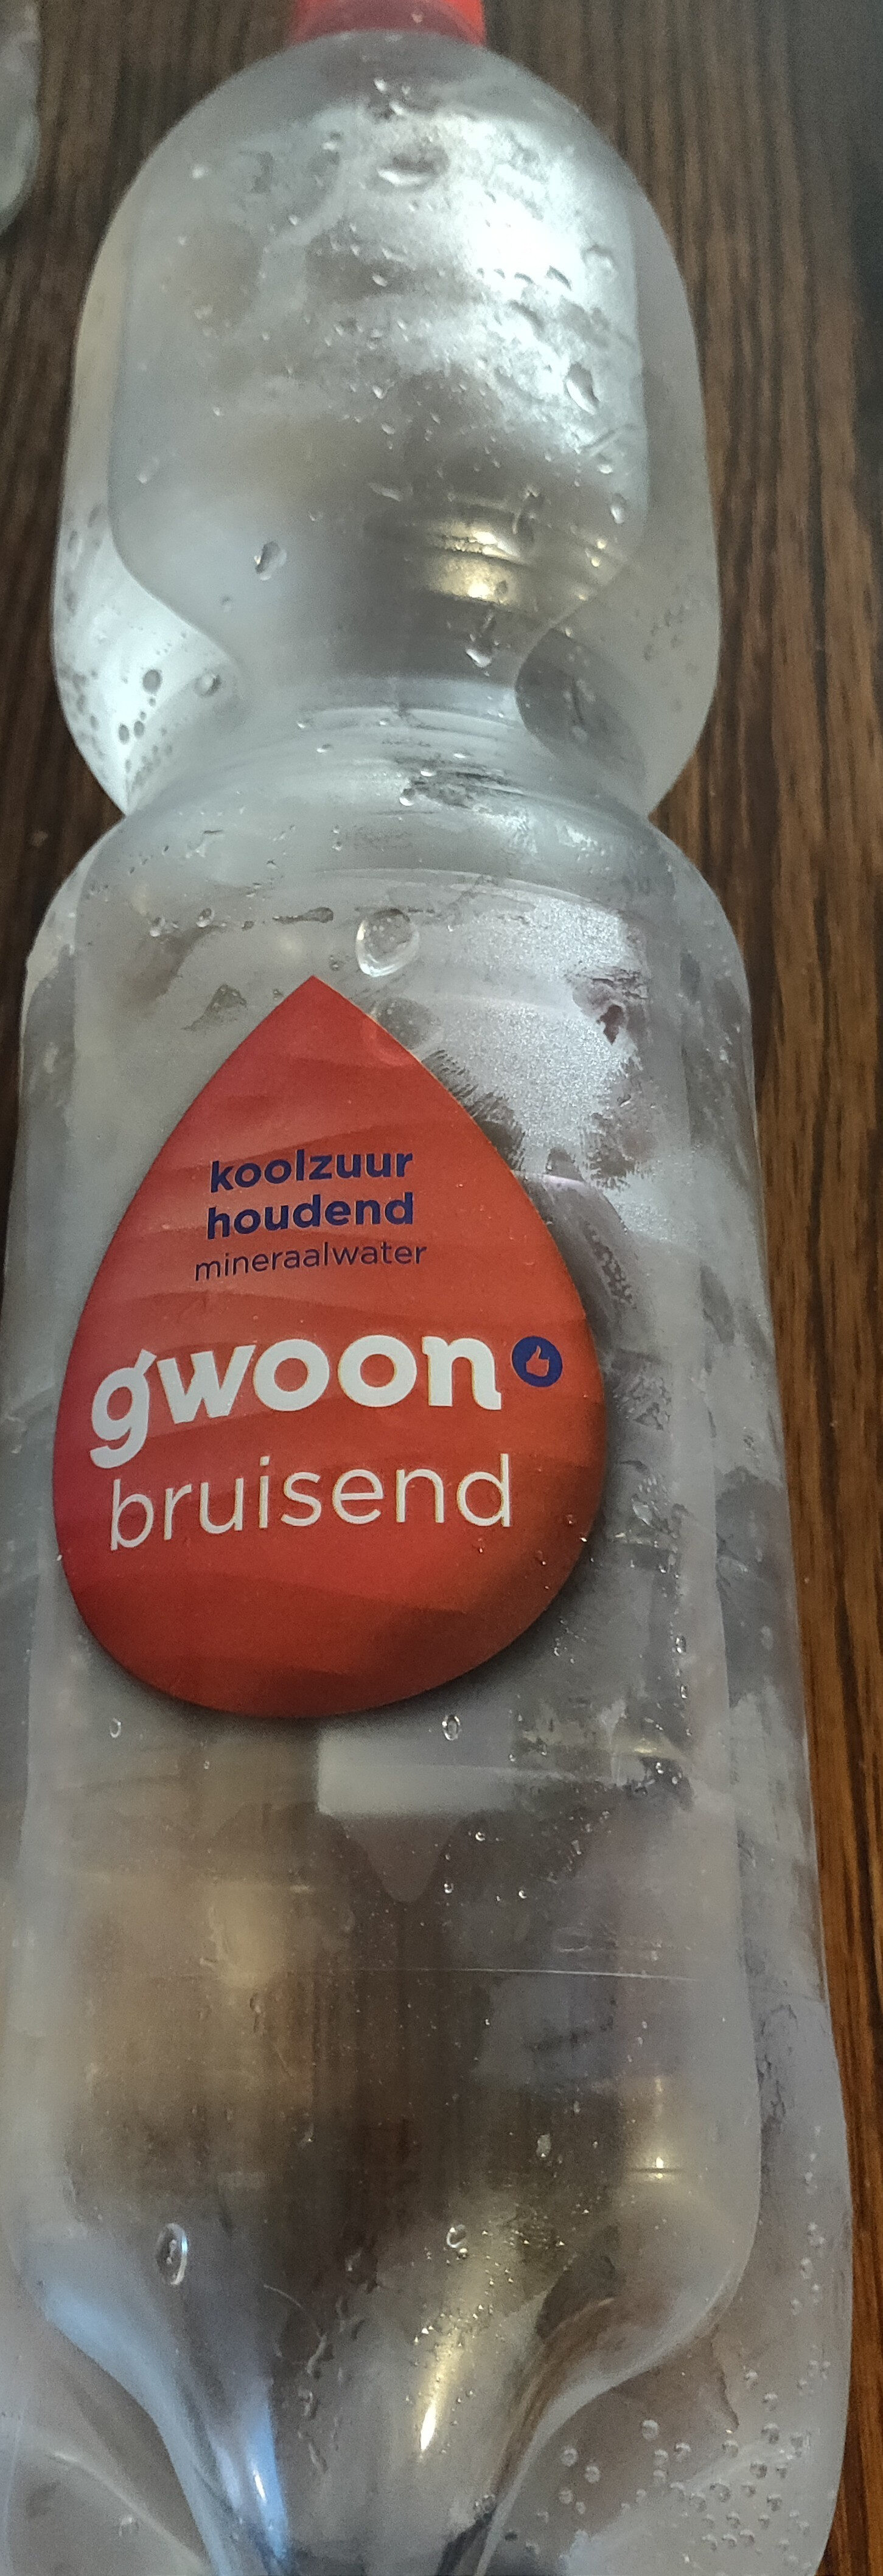 koolzuurhoudend mineraalwater - Product - nl